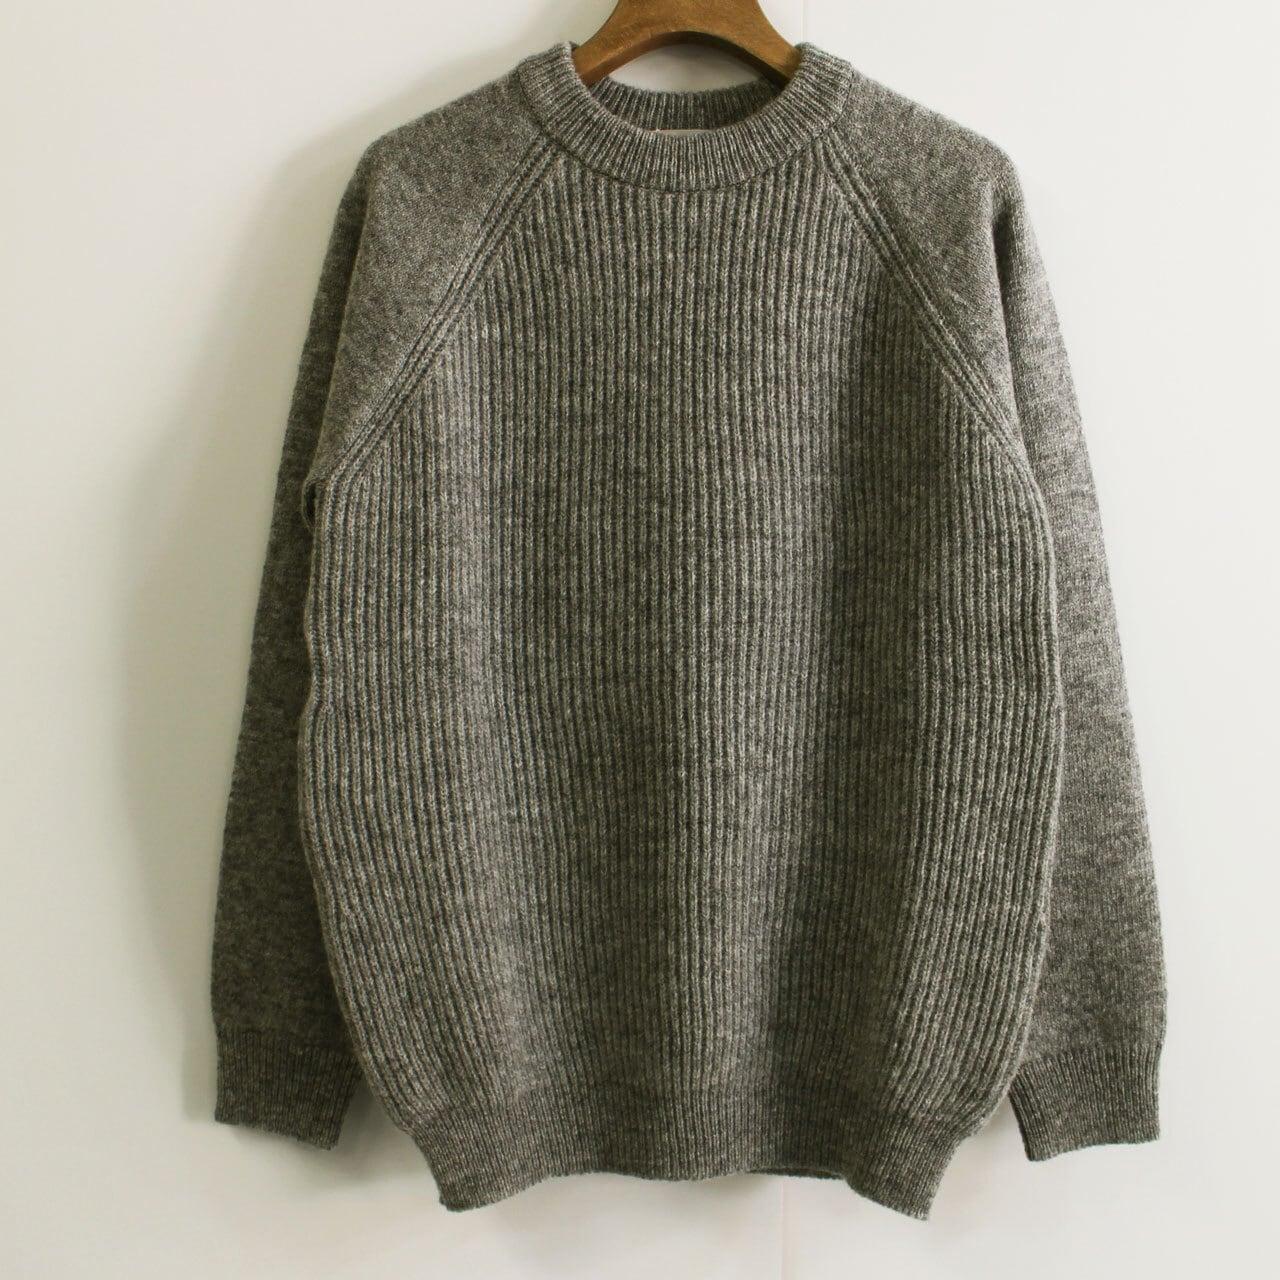 SOGLIA  ソリア  LERWICK  SWEATER ラーウィックセーター シェットランドウールセーター